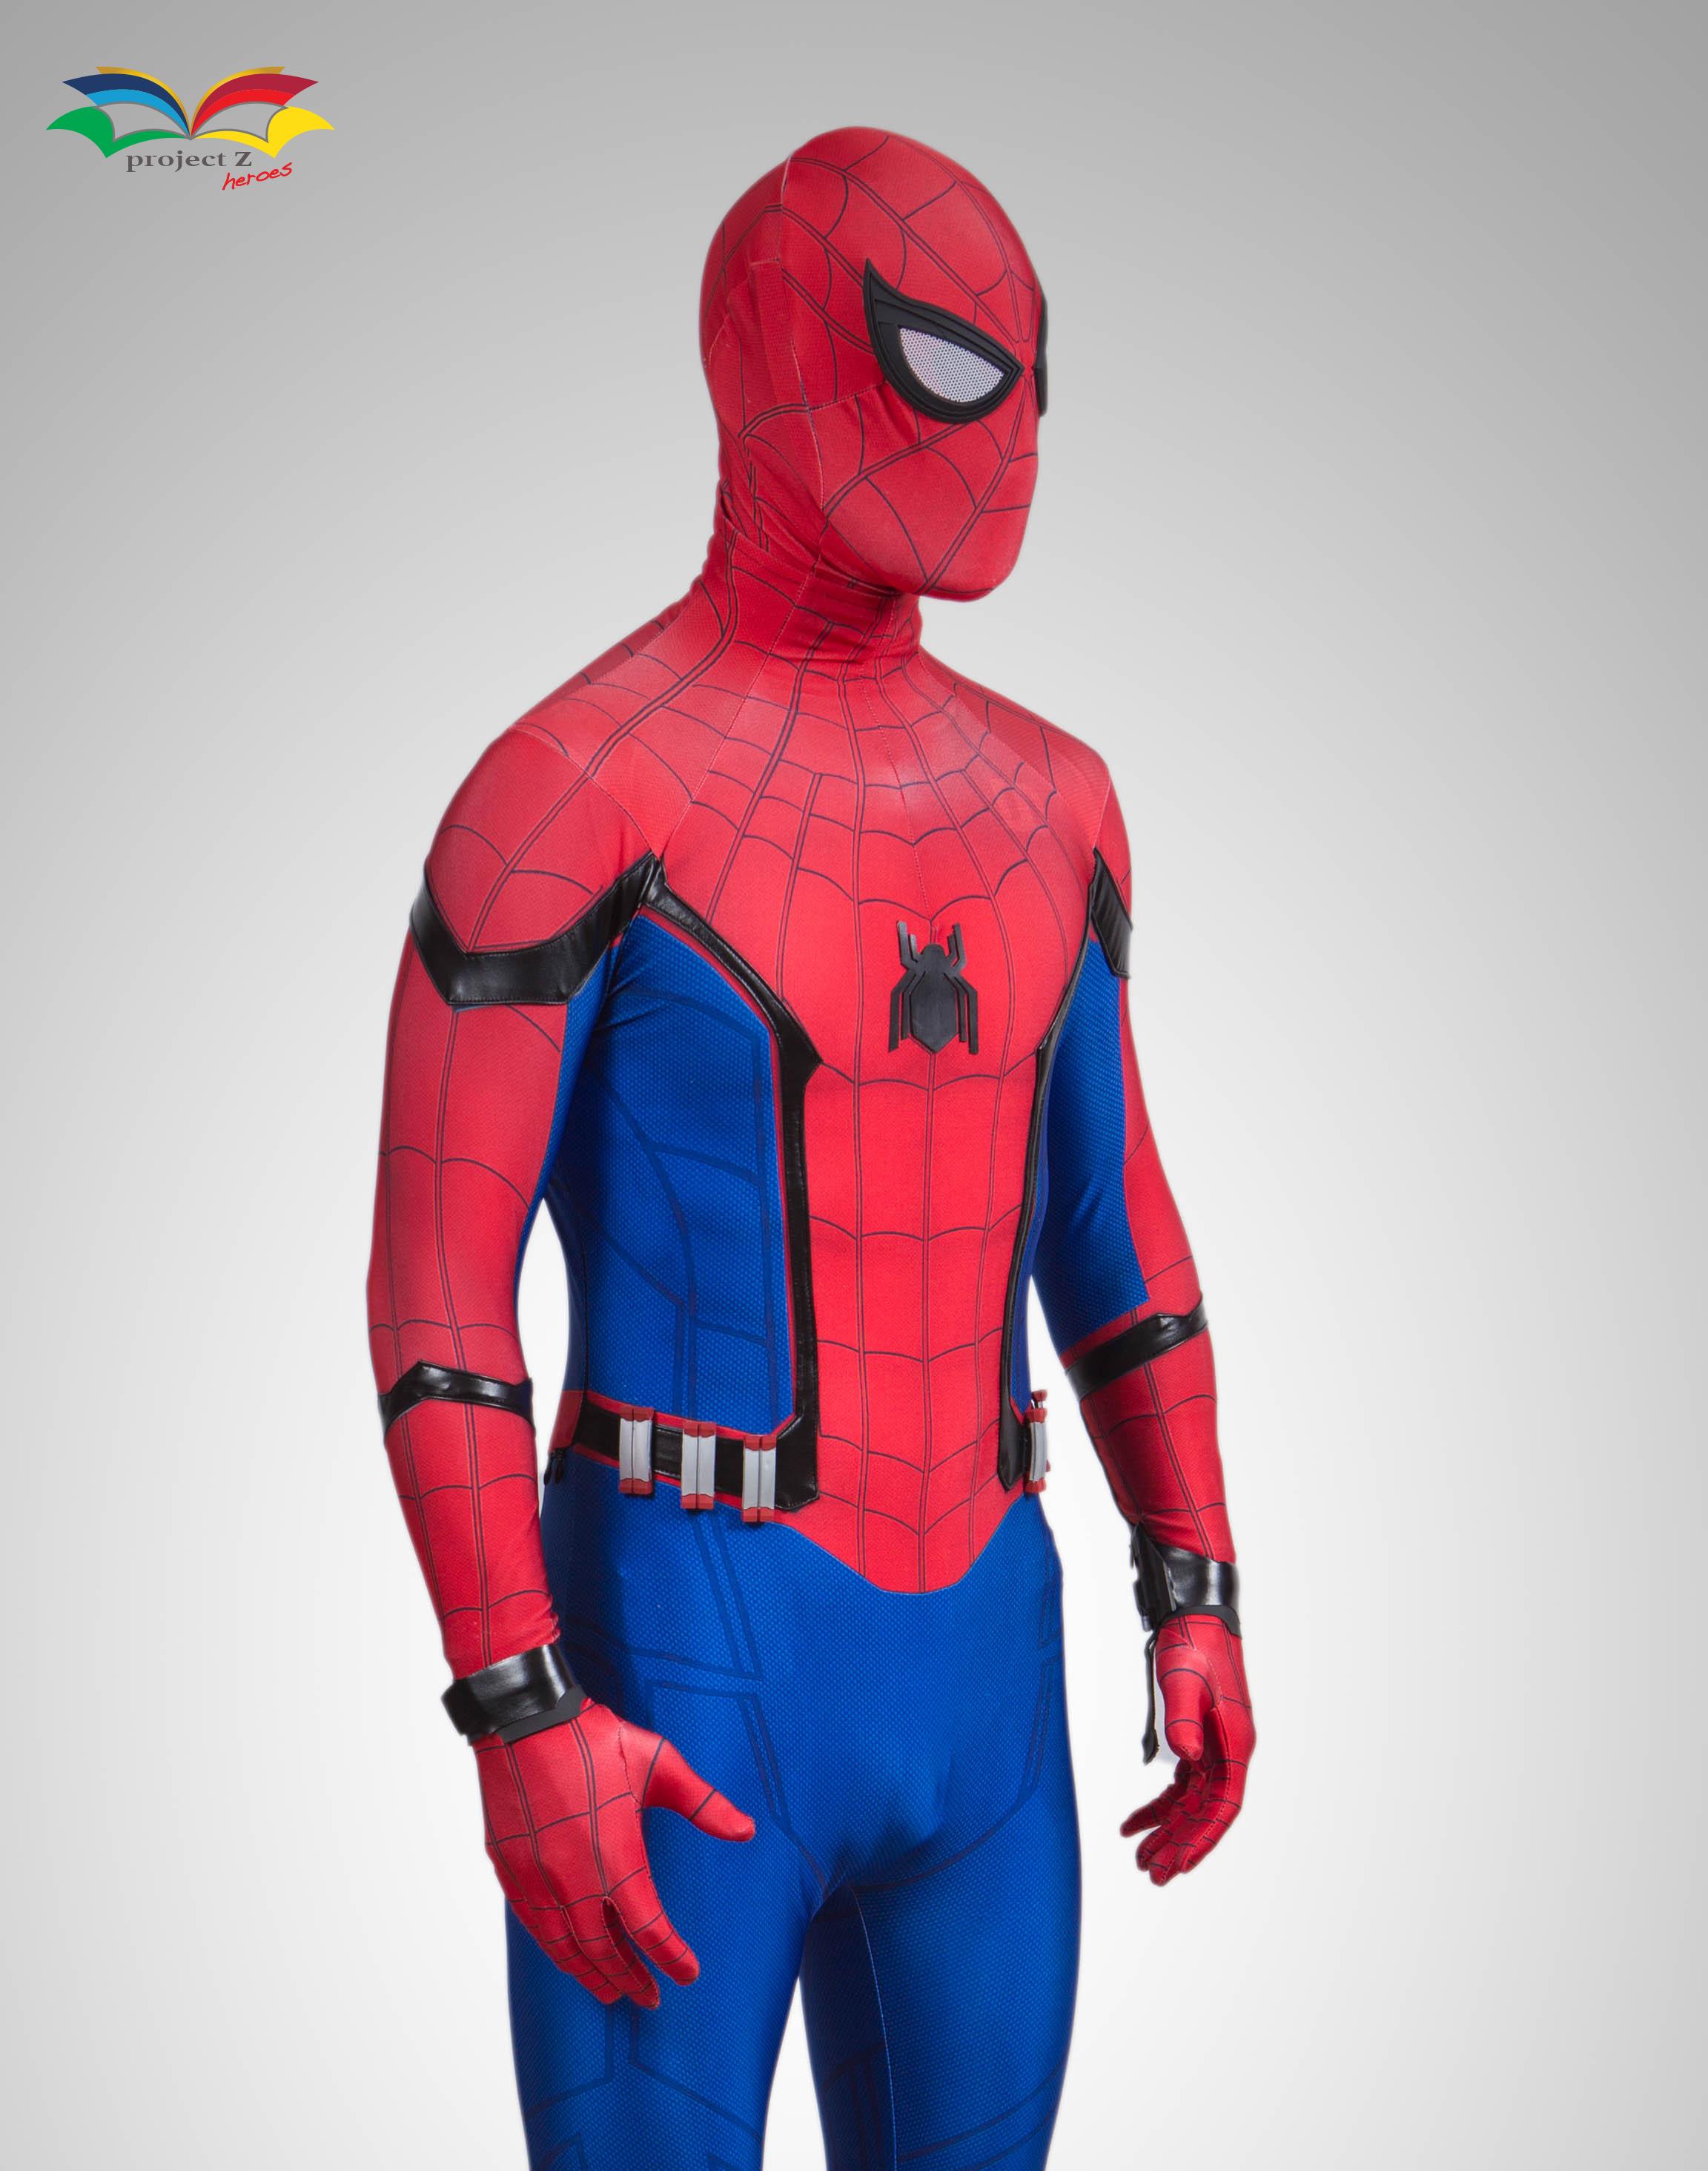 Spiderman homecoming costume frontsideway 2